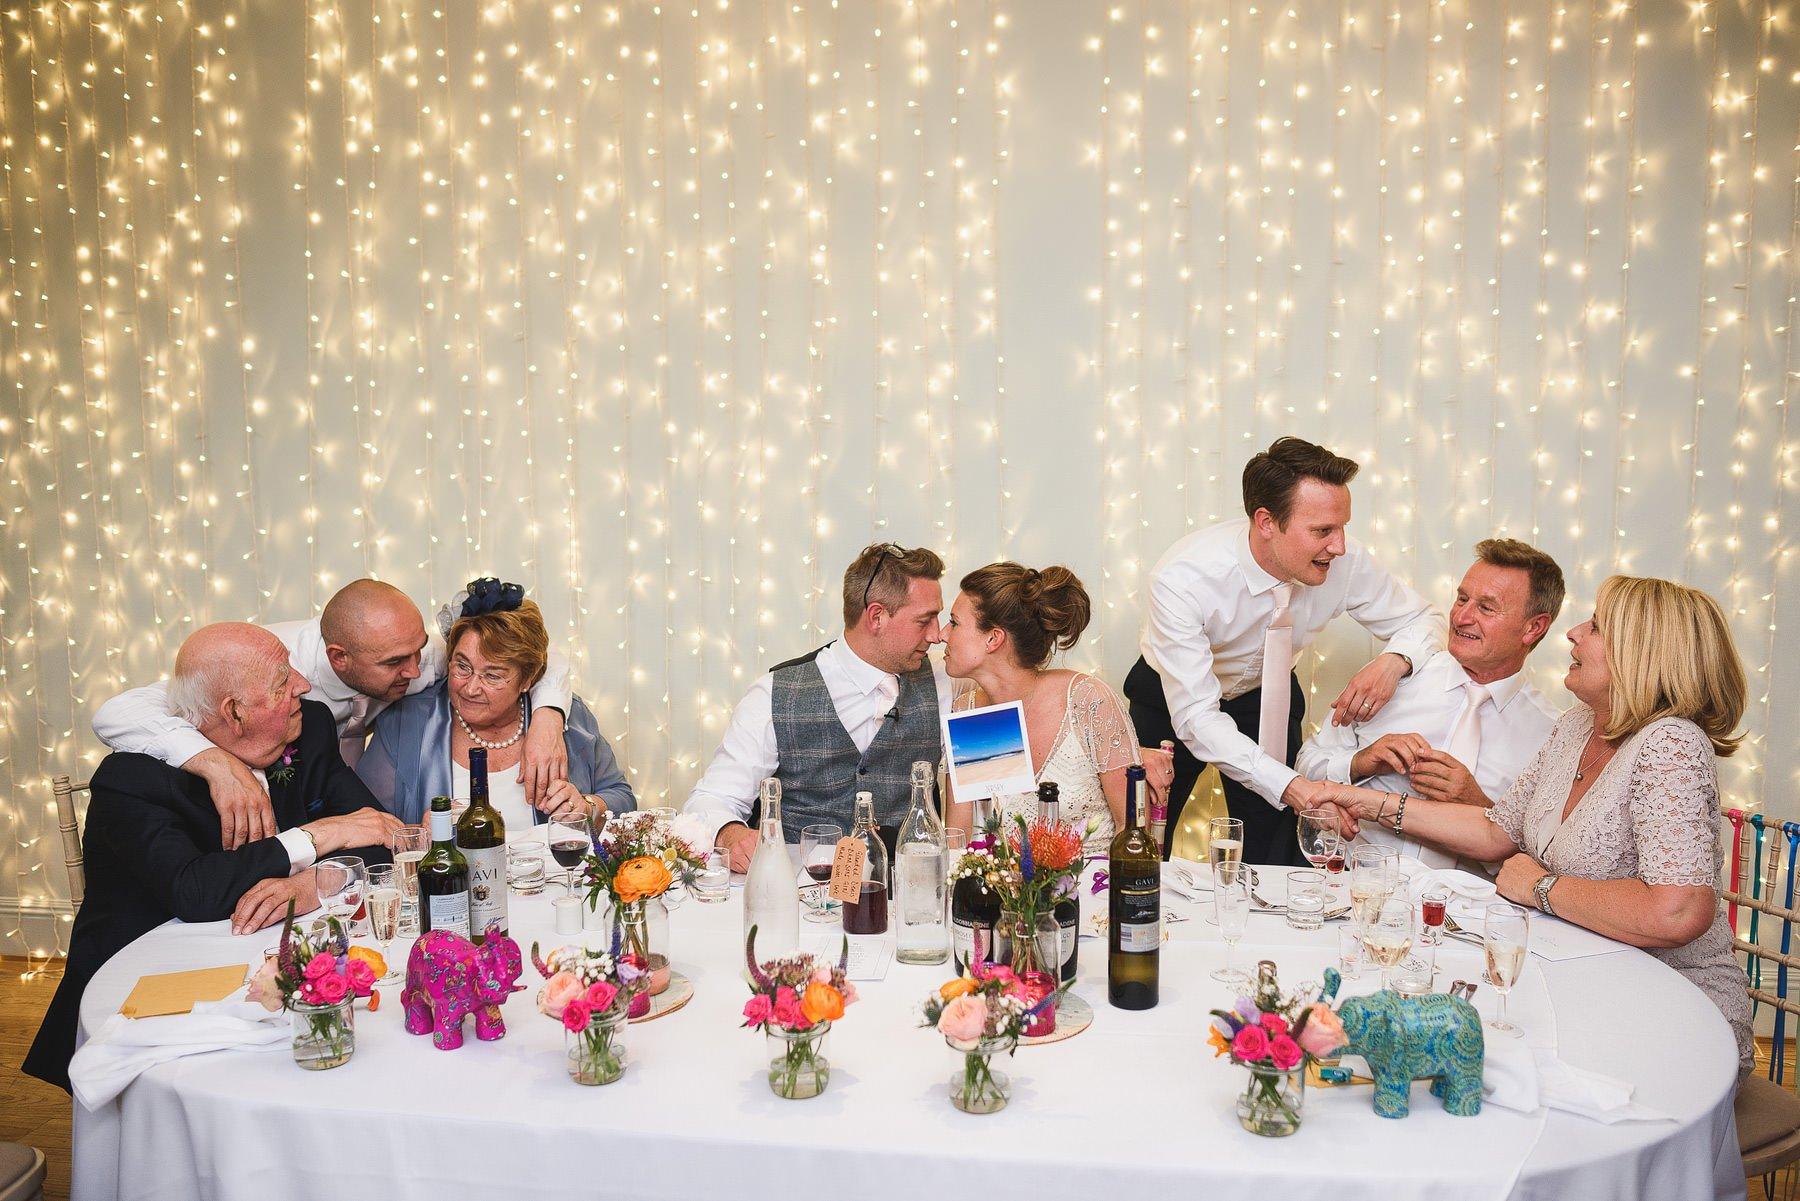 amazing wedding photos at matara